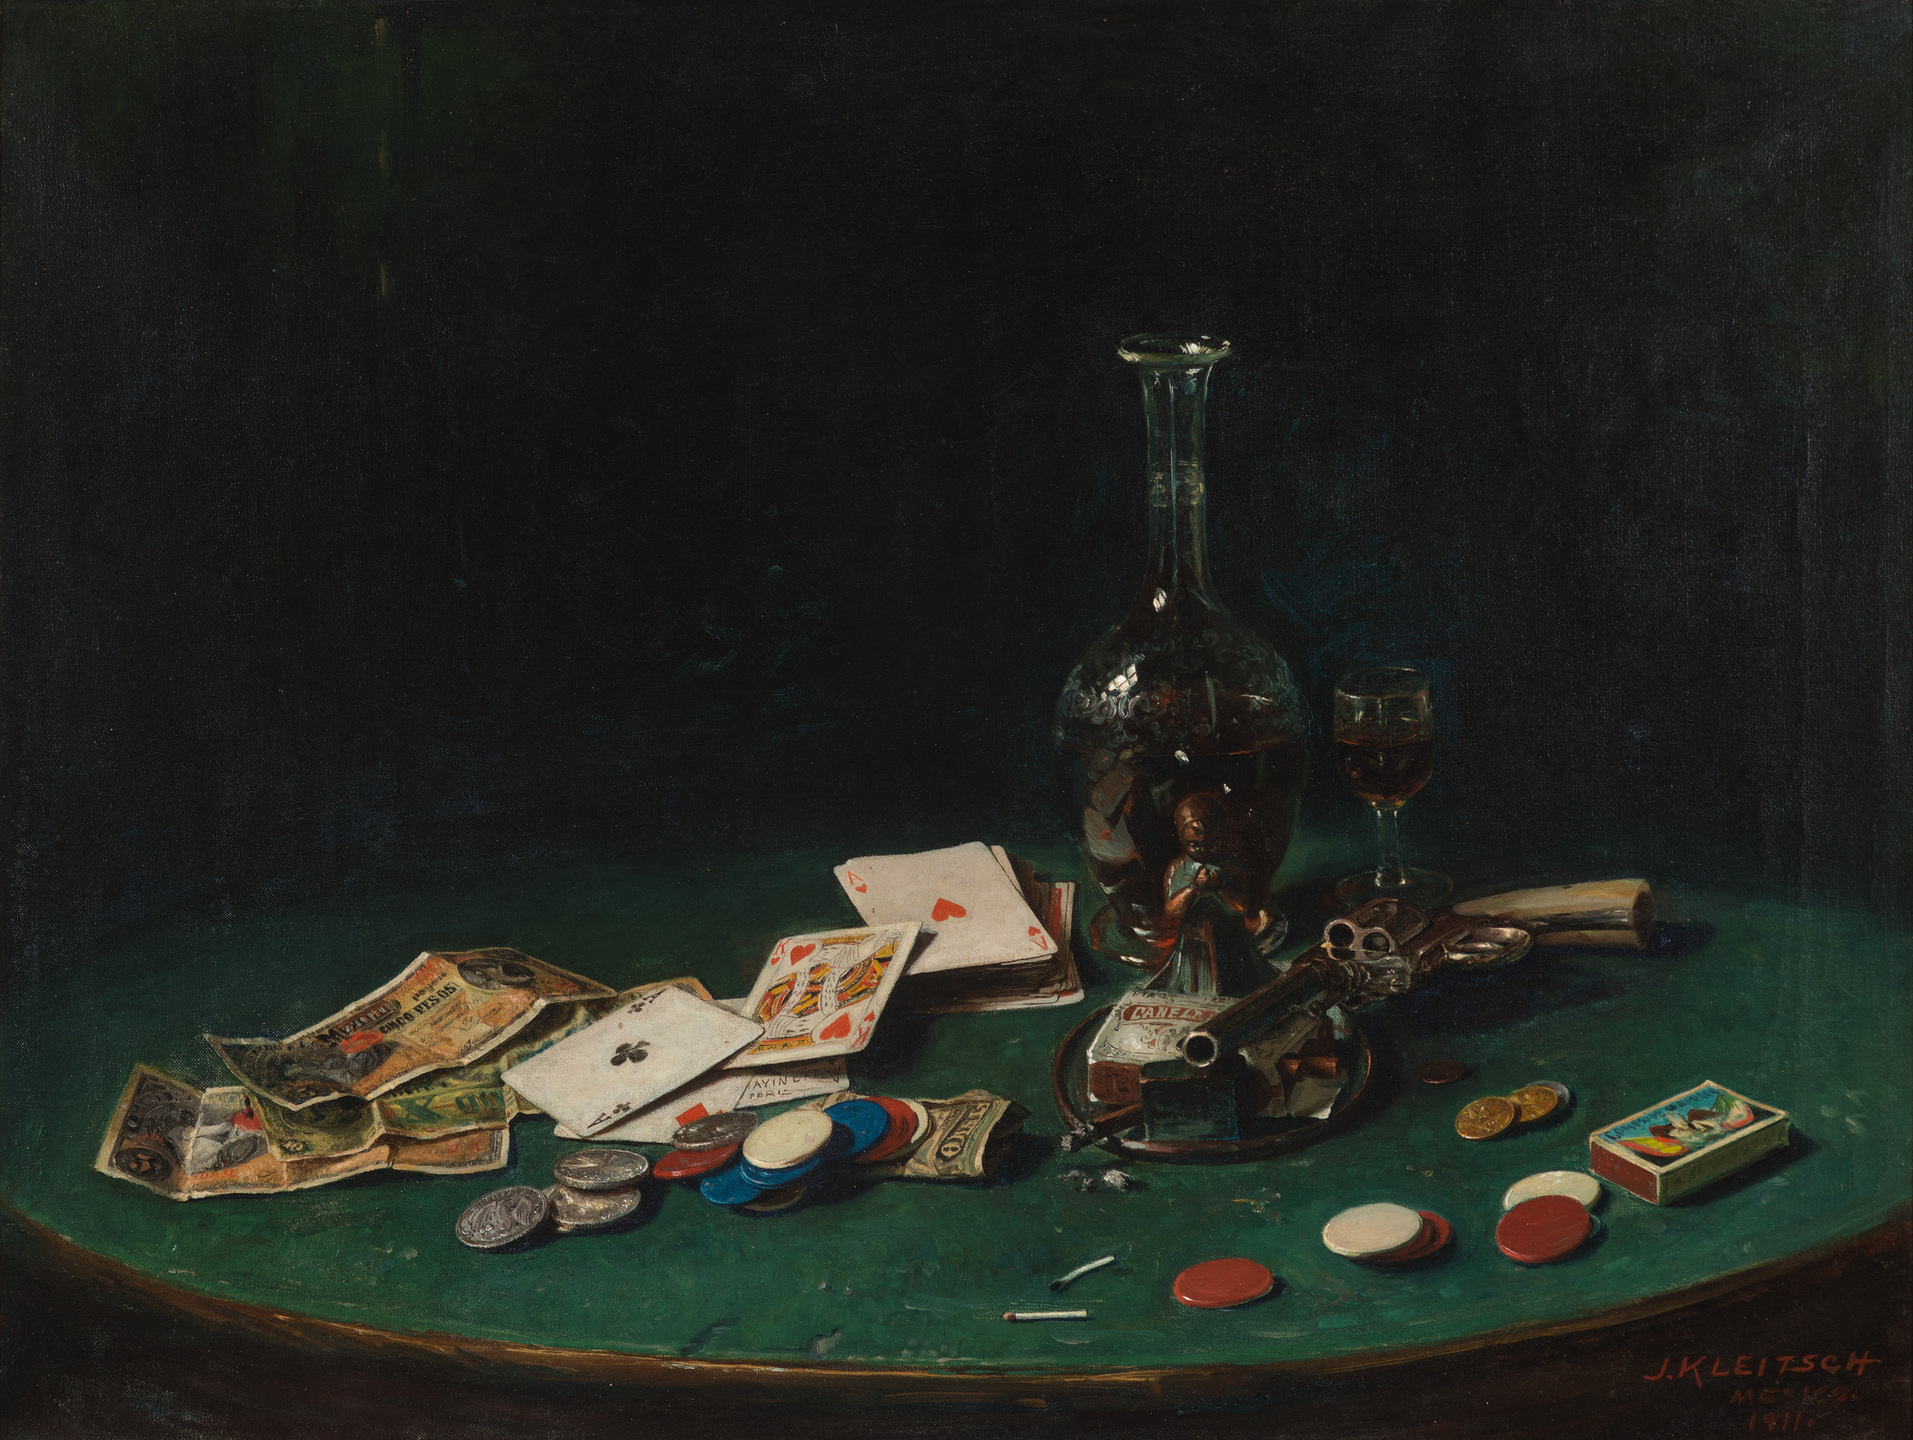 Joseph Kleitsch Oil Painting